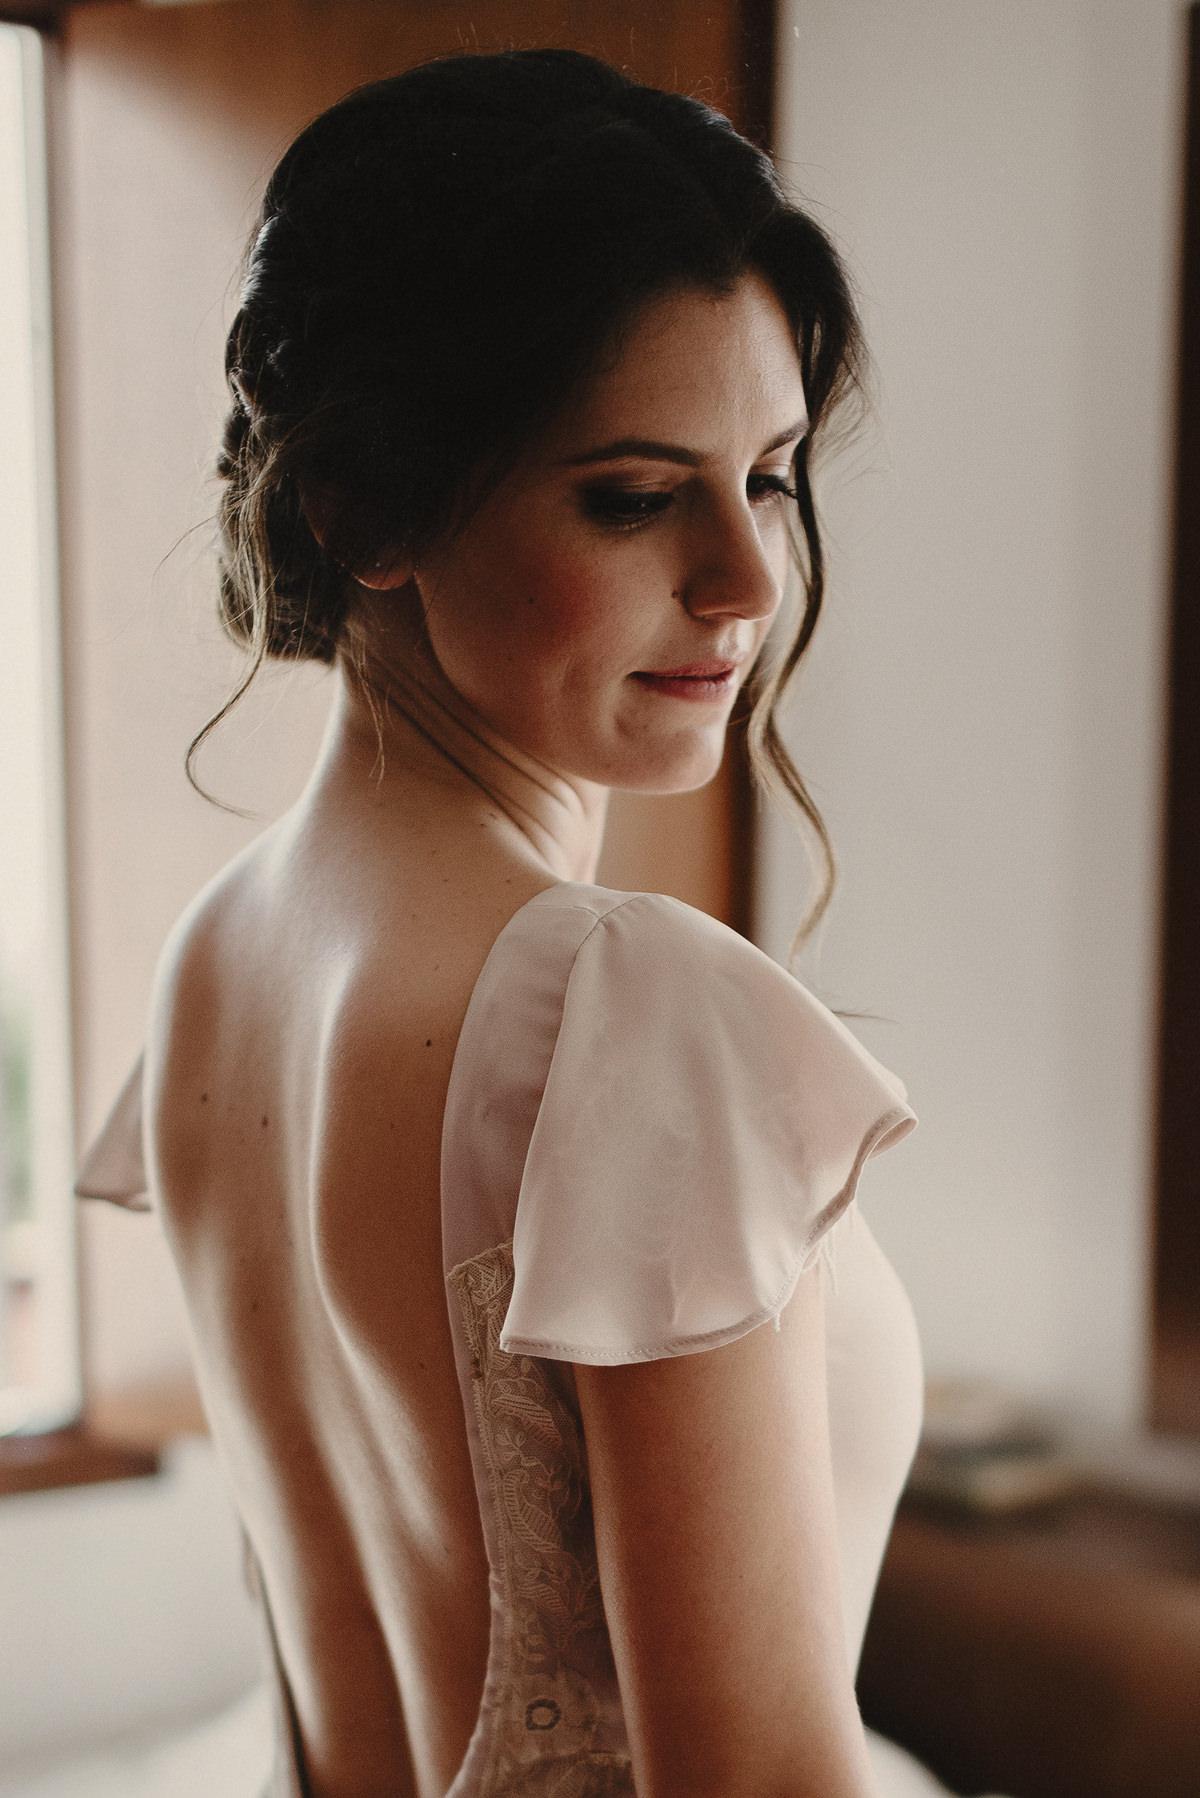 christiangarcia_ae_wedding_photographer_00024.jpg